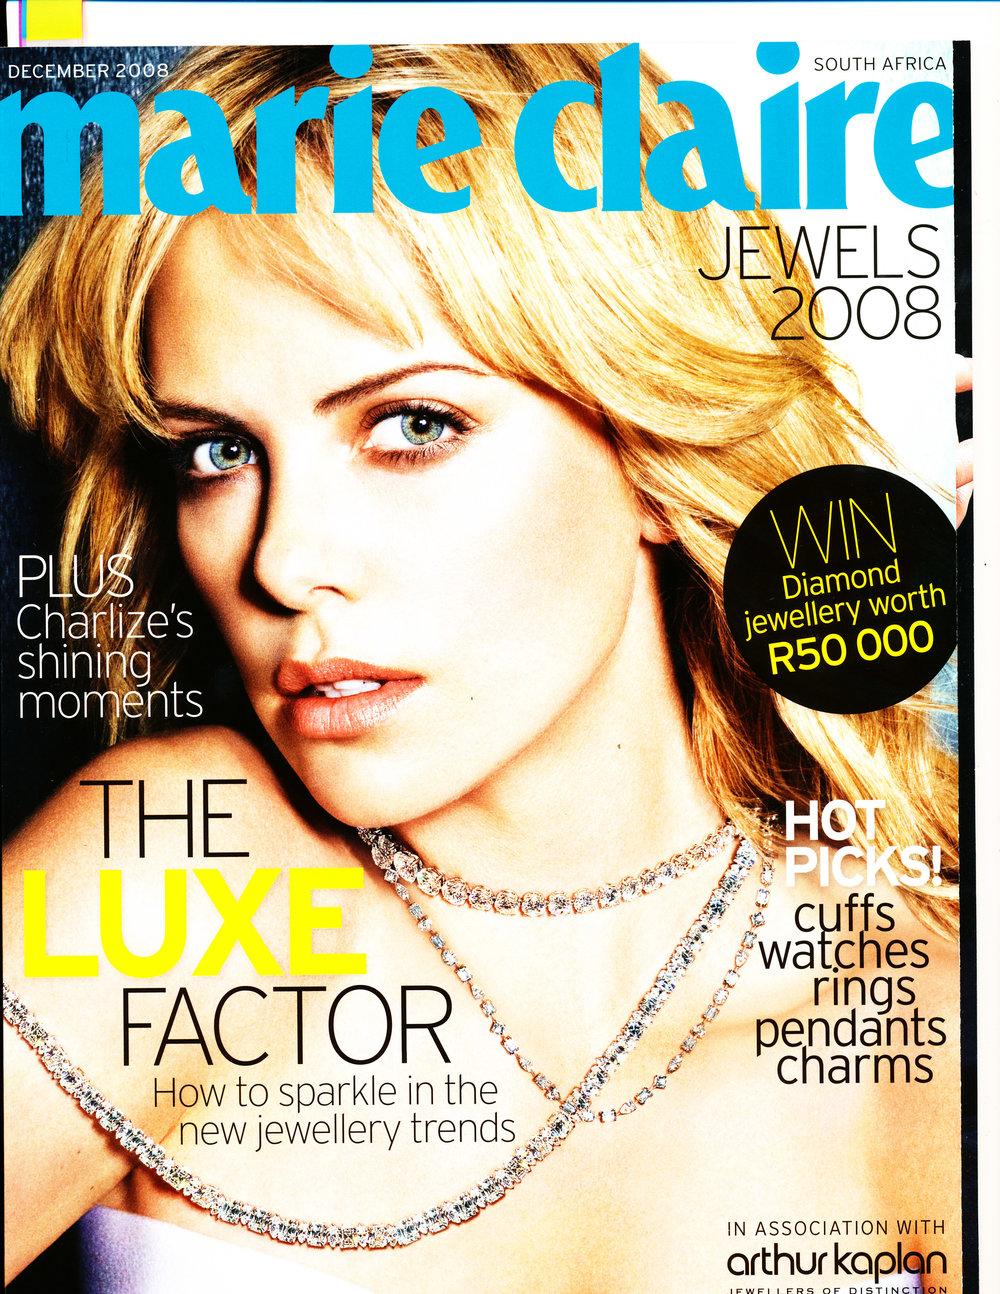 MARIE CLAIRE DEC 2008